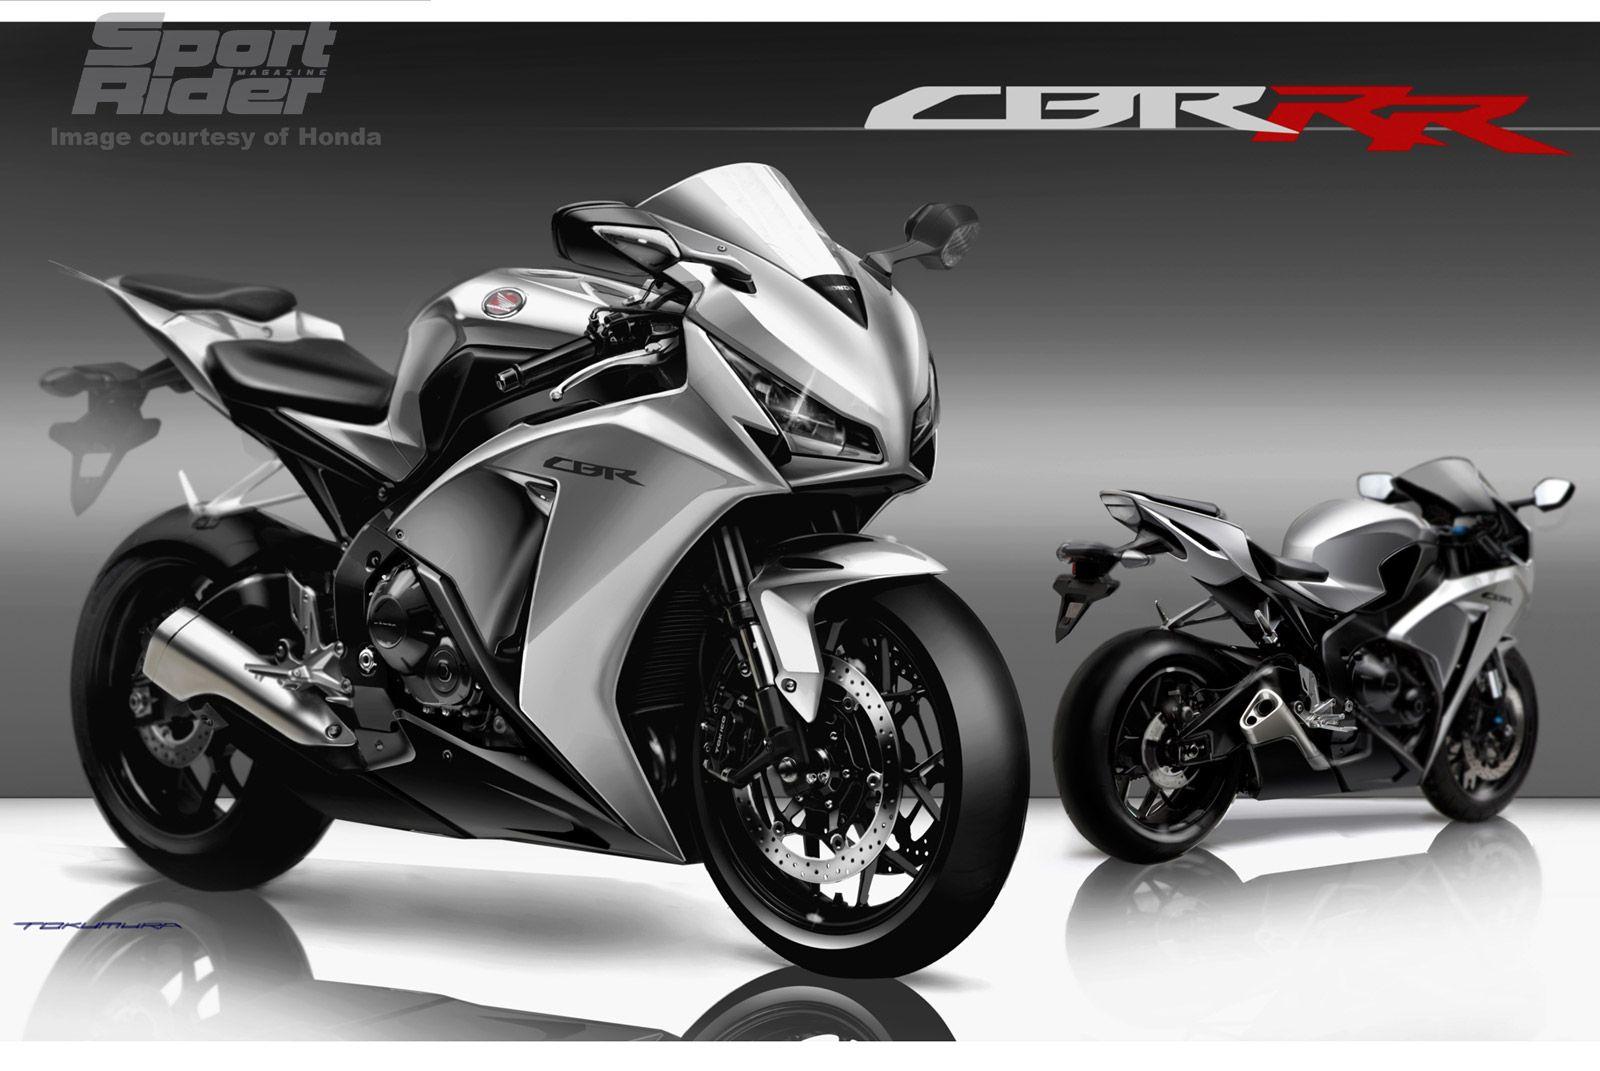 Honda cbr 2014 sports super sports bike photo - 2014 Honda Cbr1000rr 13731 Hd Wallpapers In Bikes Telusers Com